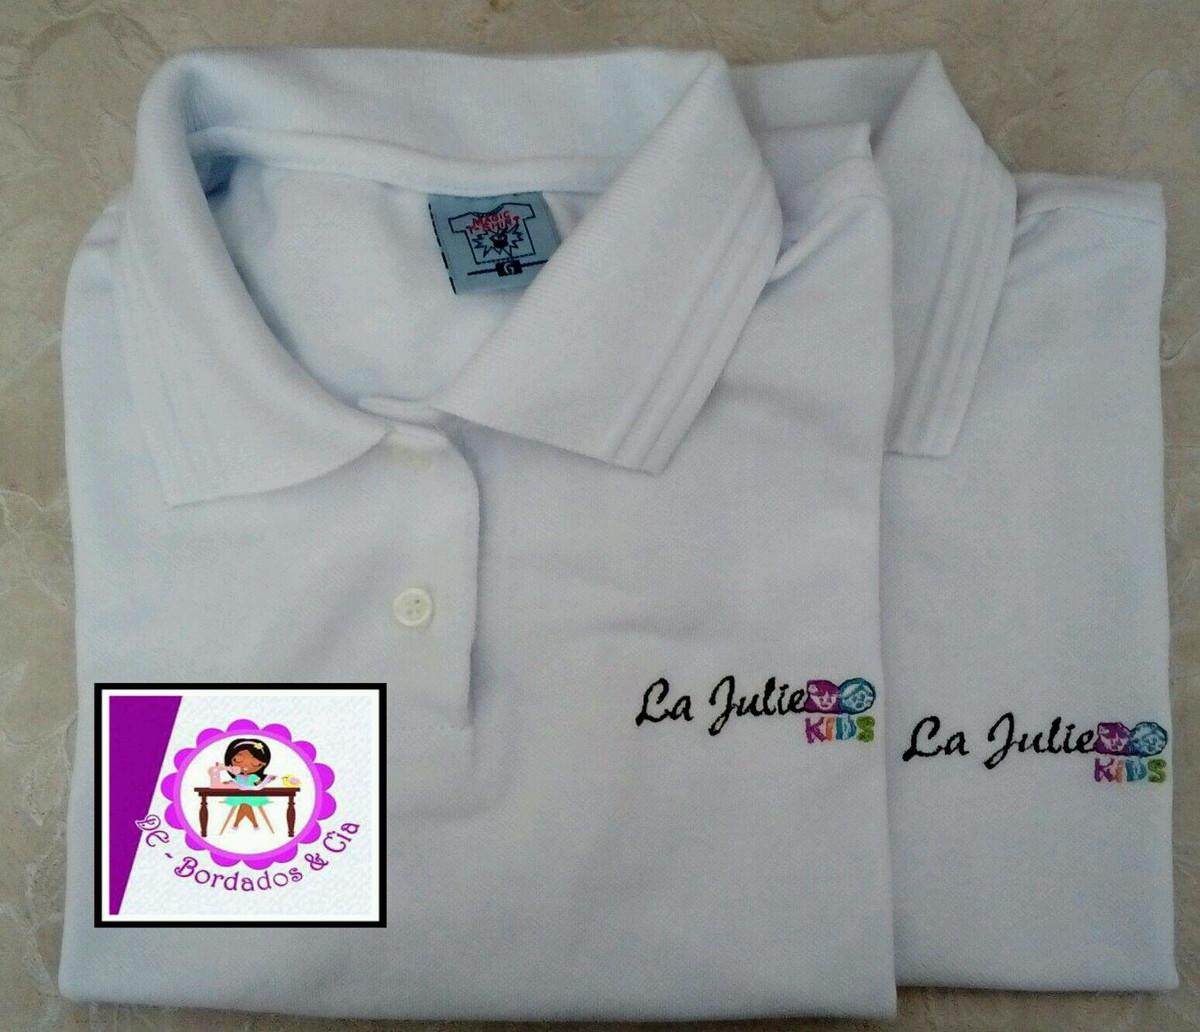 Polo Personalizada s bordado - Feminina no Elo7  8aef09da2dadf